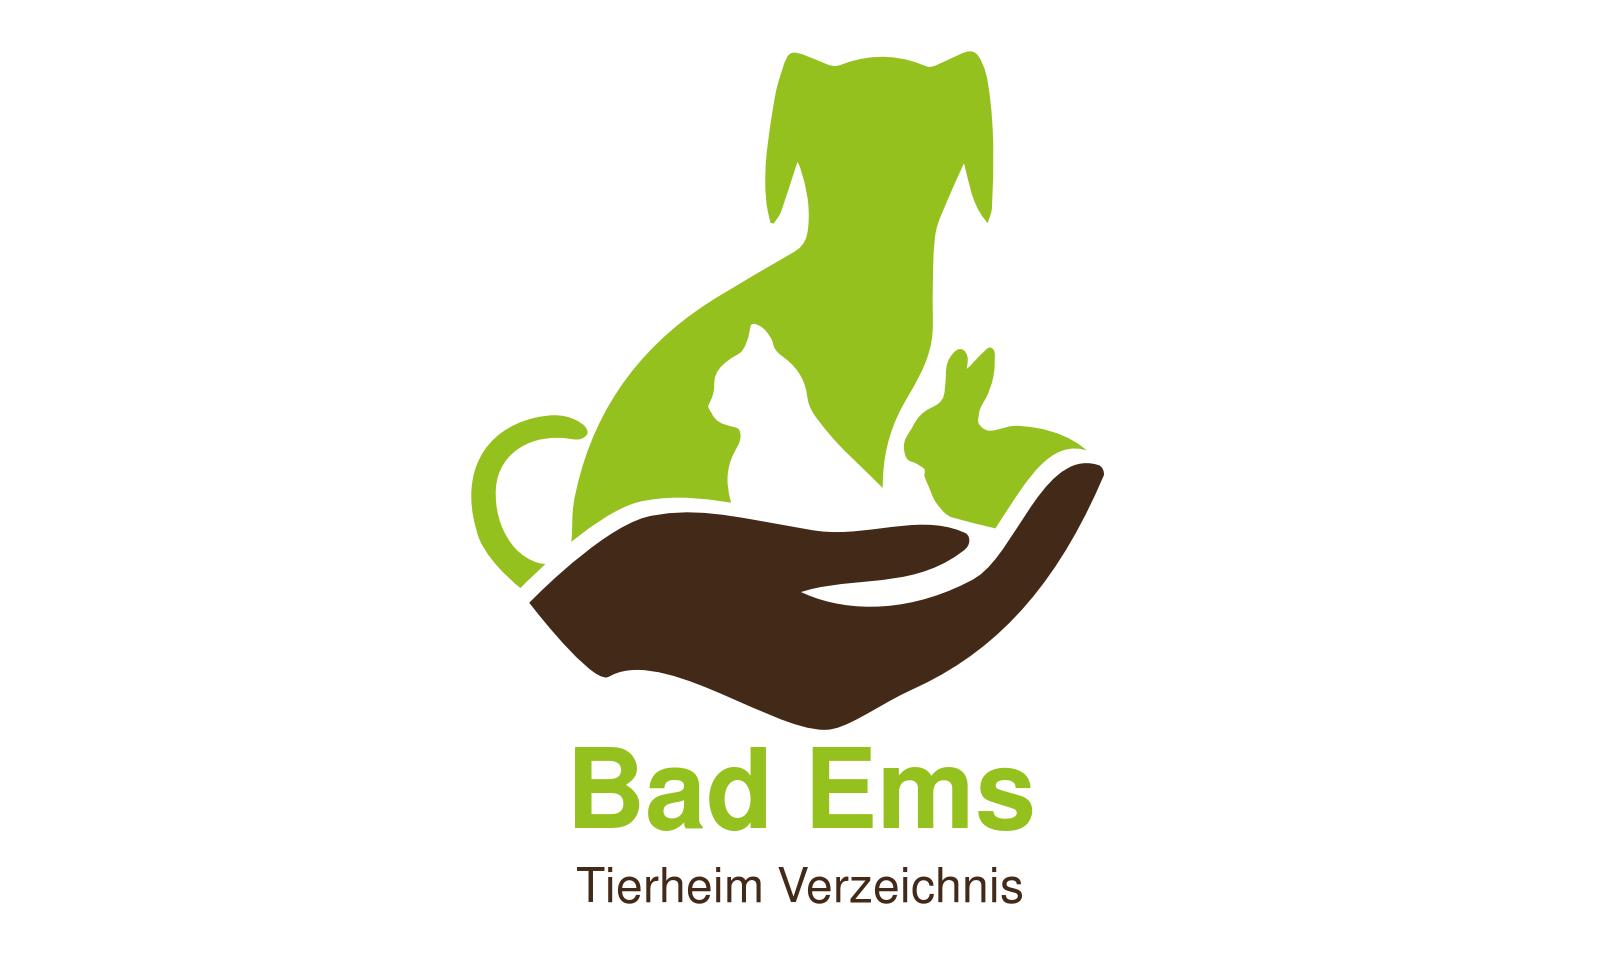 Tierheim Bad Ems